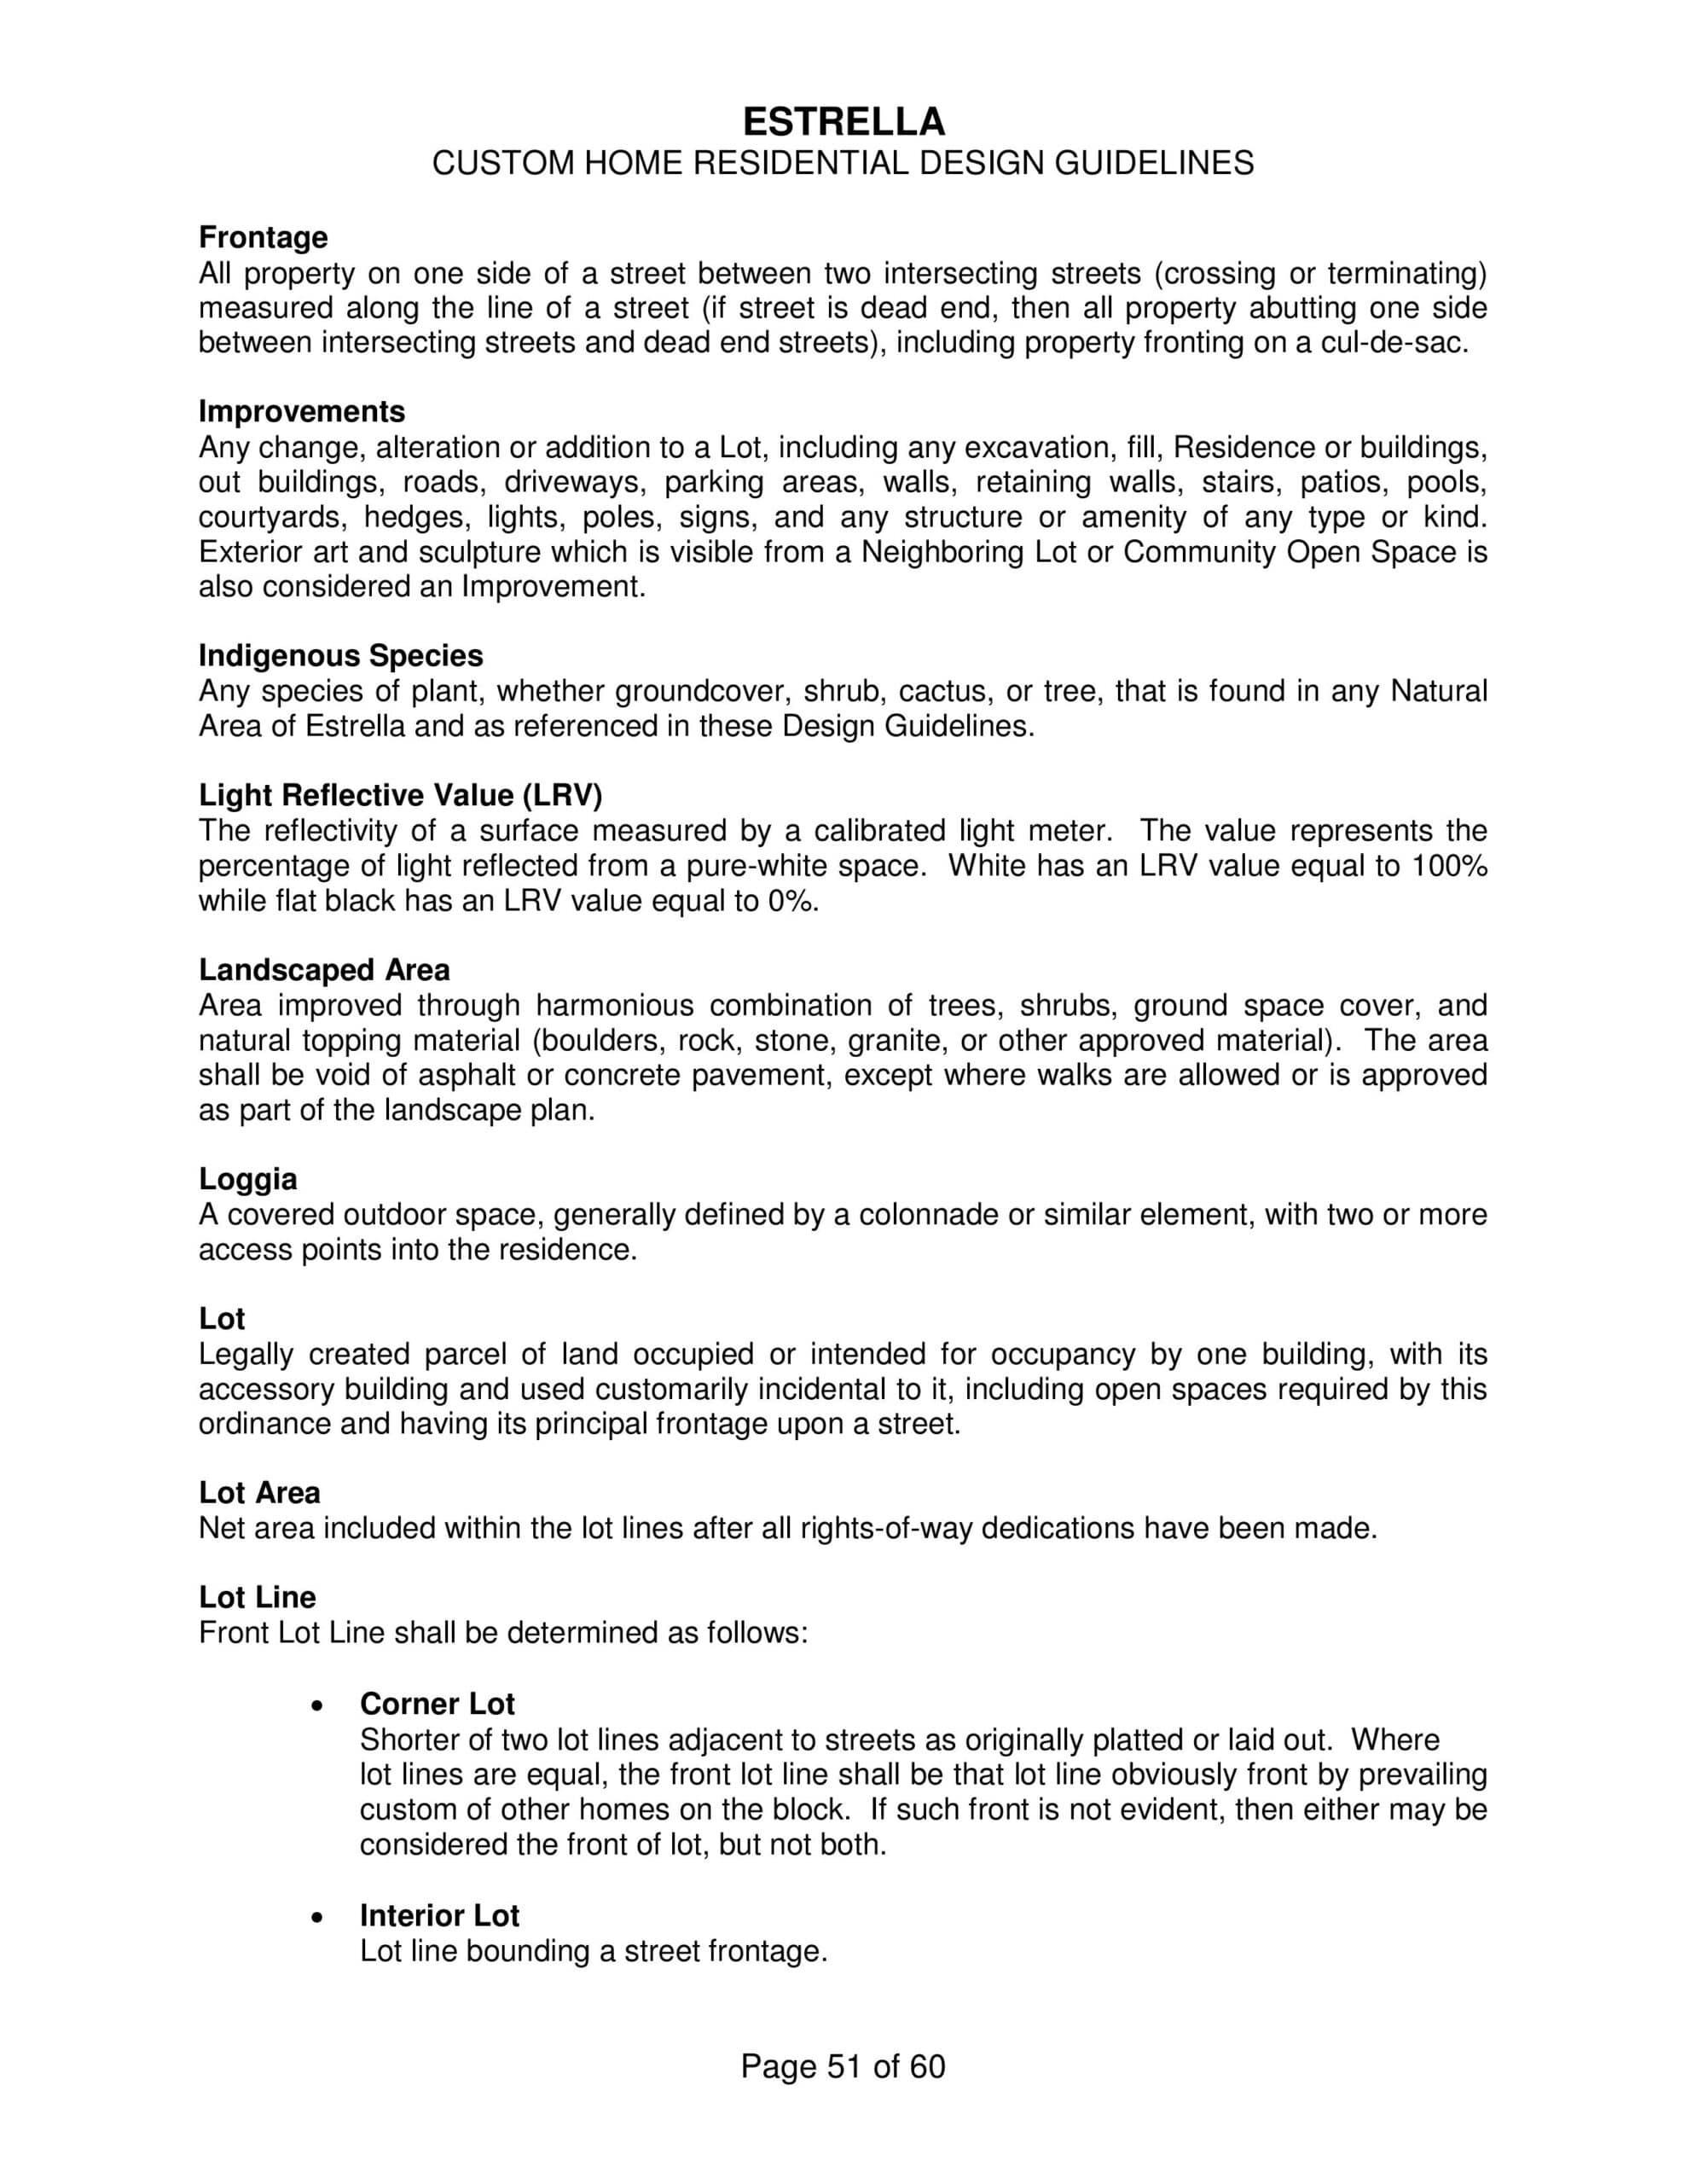 ESTRELLA MOUNTAIN CUSTOM HOME GUIDELINES-page-055